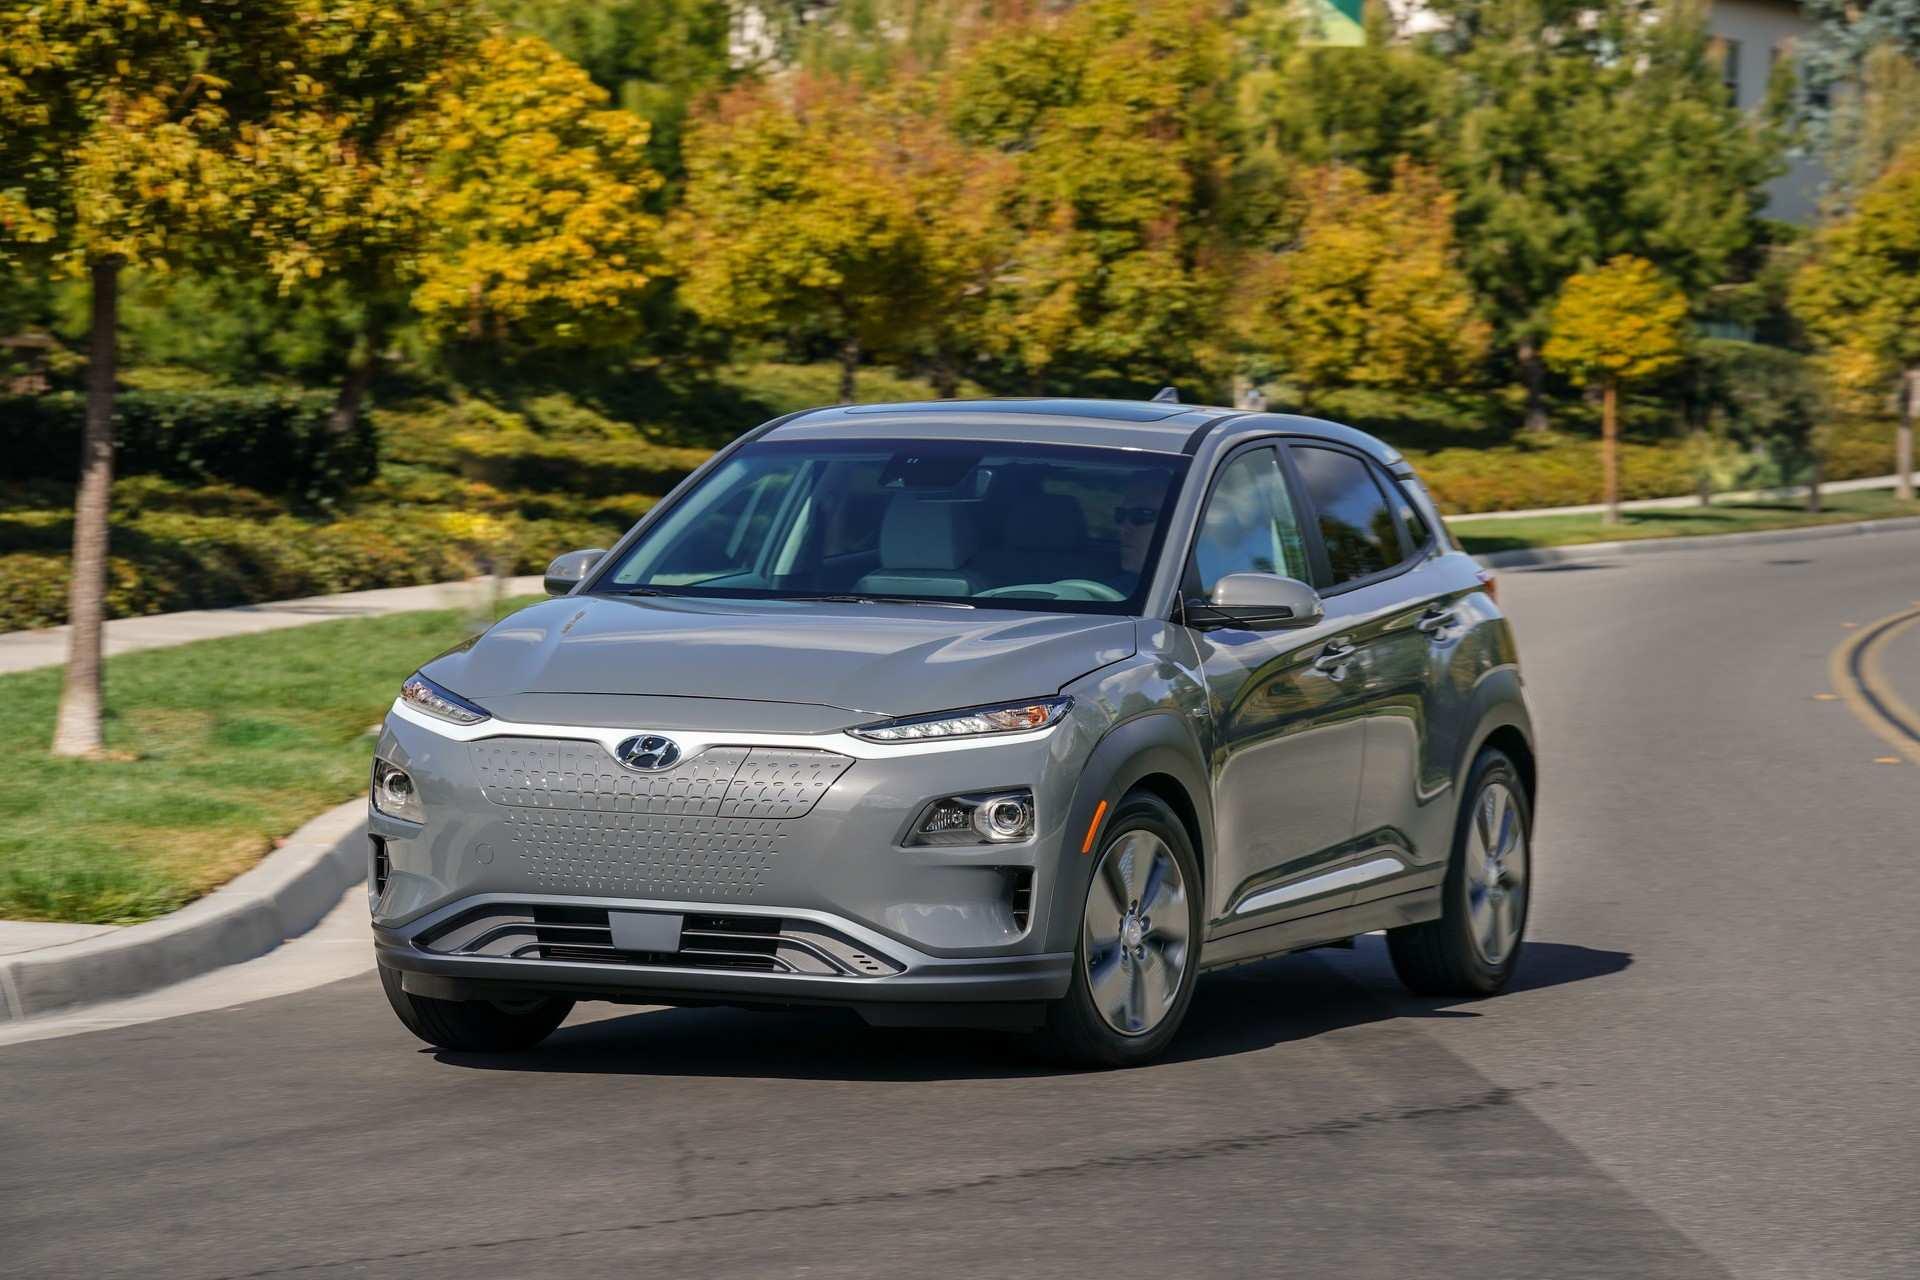 43 Best Review Hyundai Kona Ev 2020 Research New with Hyundai Kona Ev 2020